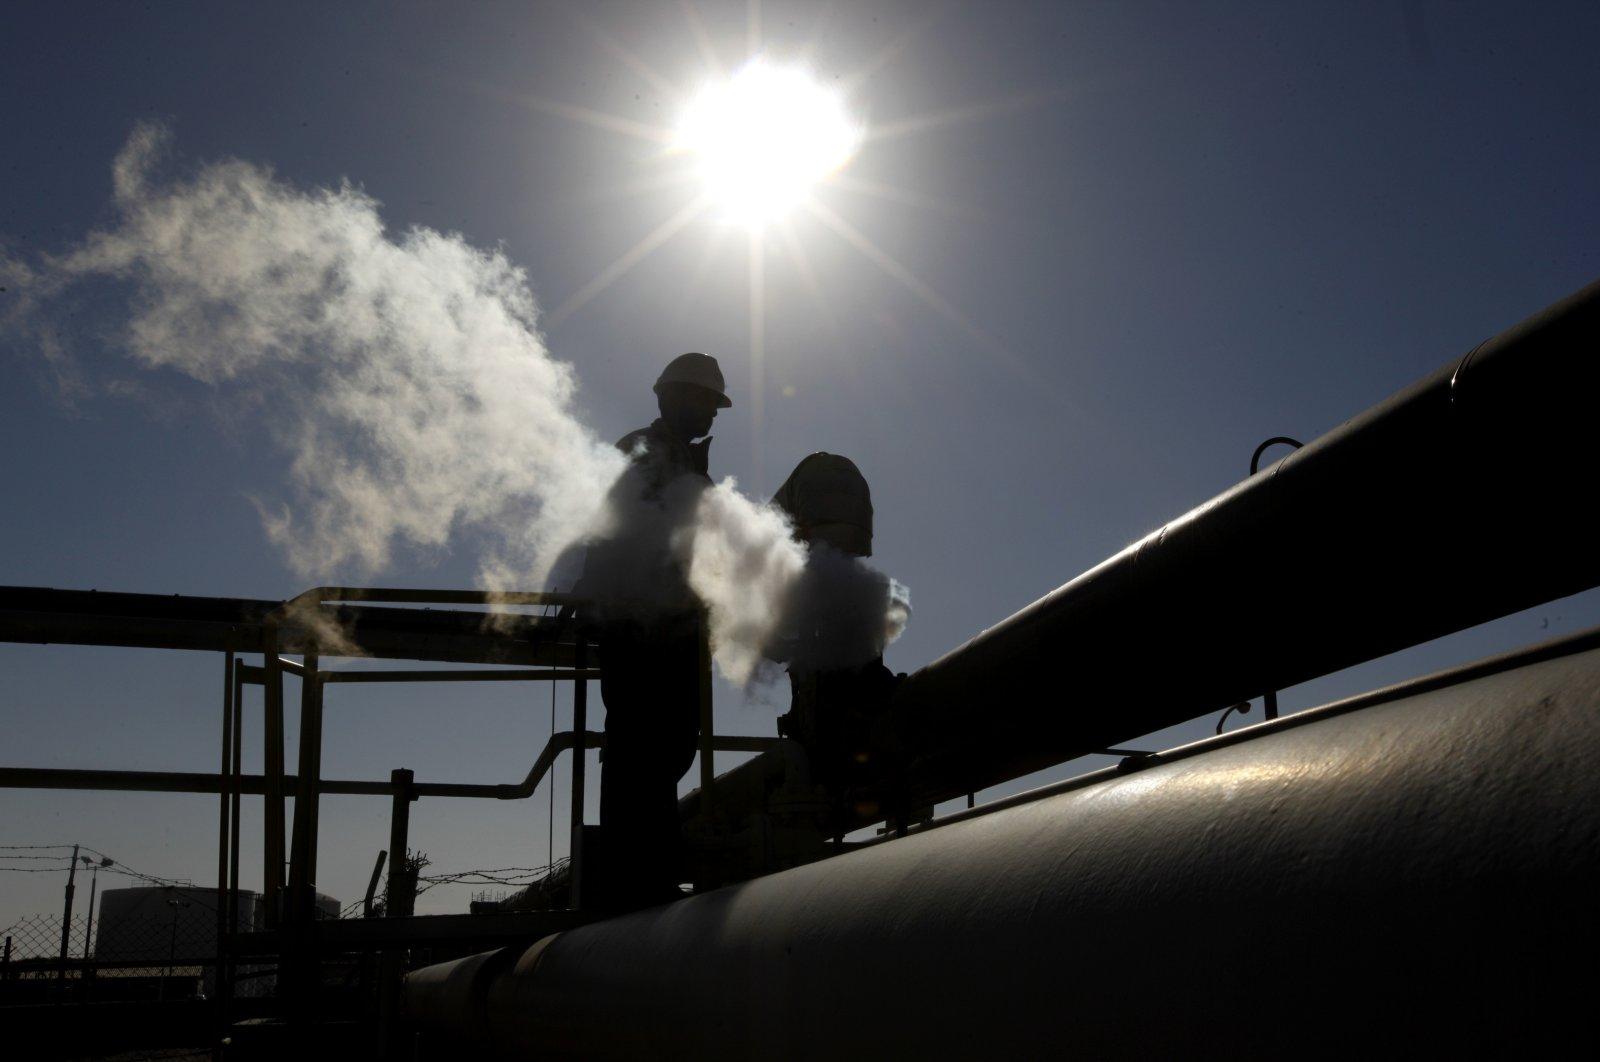 A Libyan oil worker works at a refinery inside the Brega oil complex, in Brega, eastern Libya, Feb. 26, 2011. (AP File Photo)